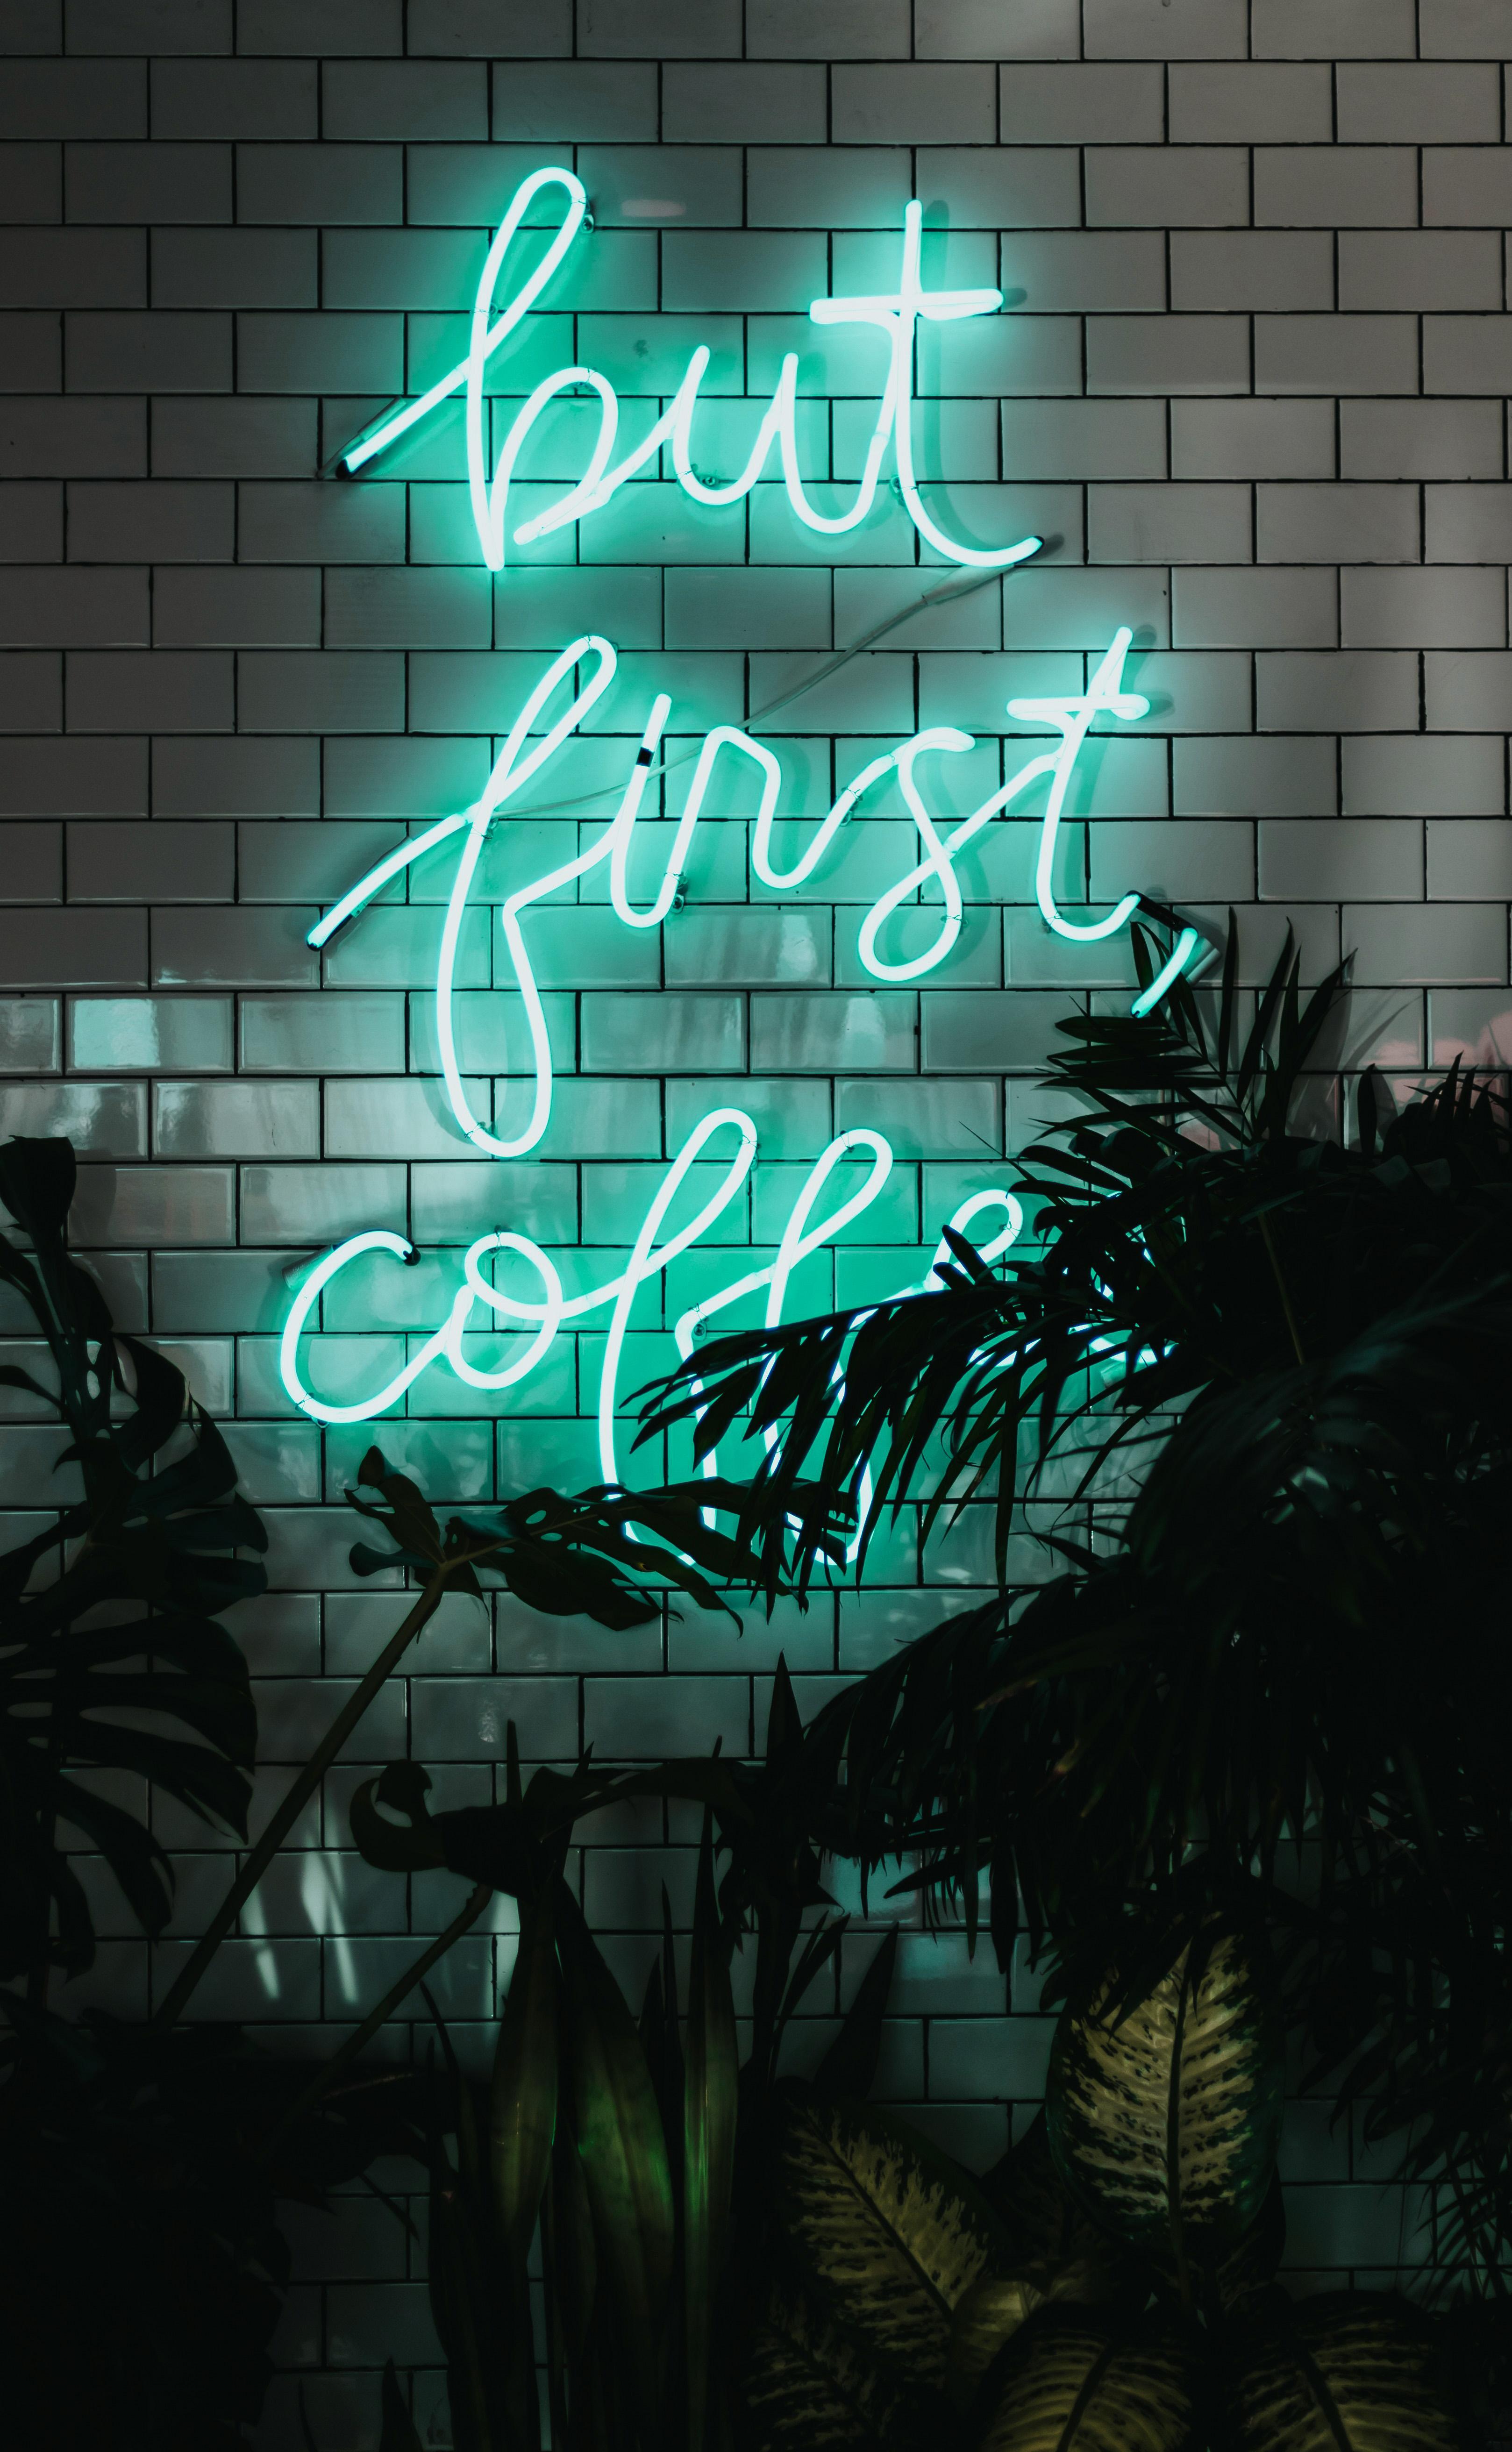 butfirstcoffee2kopie